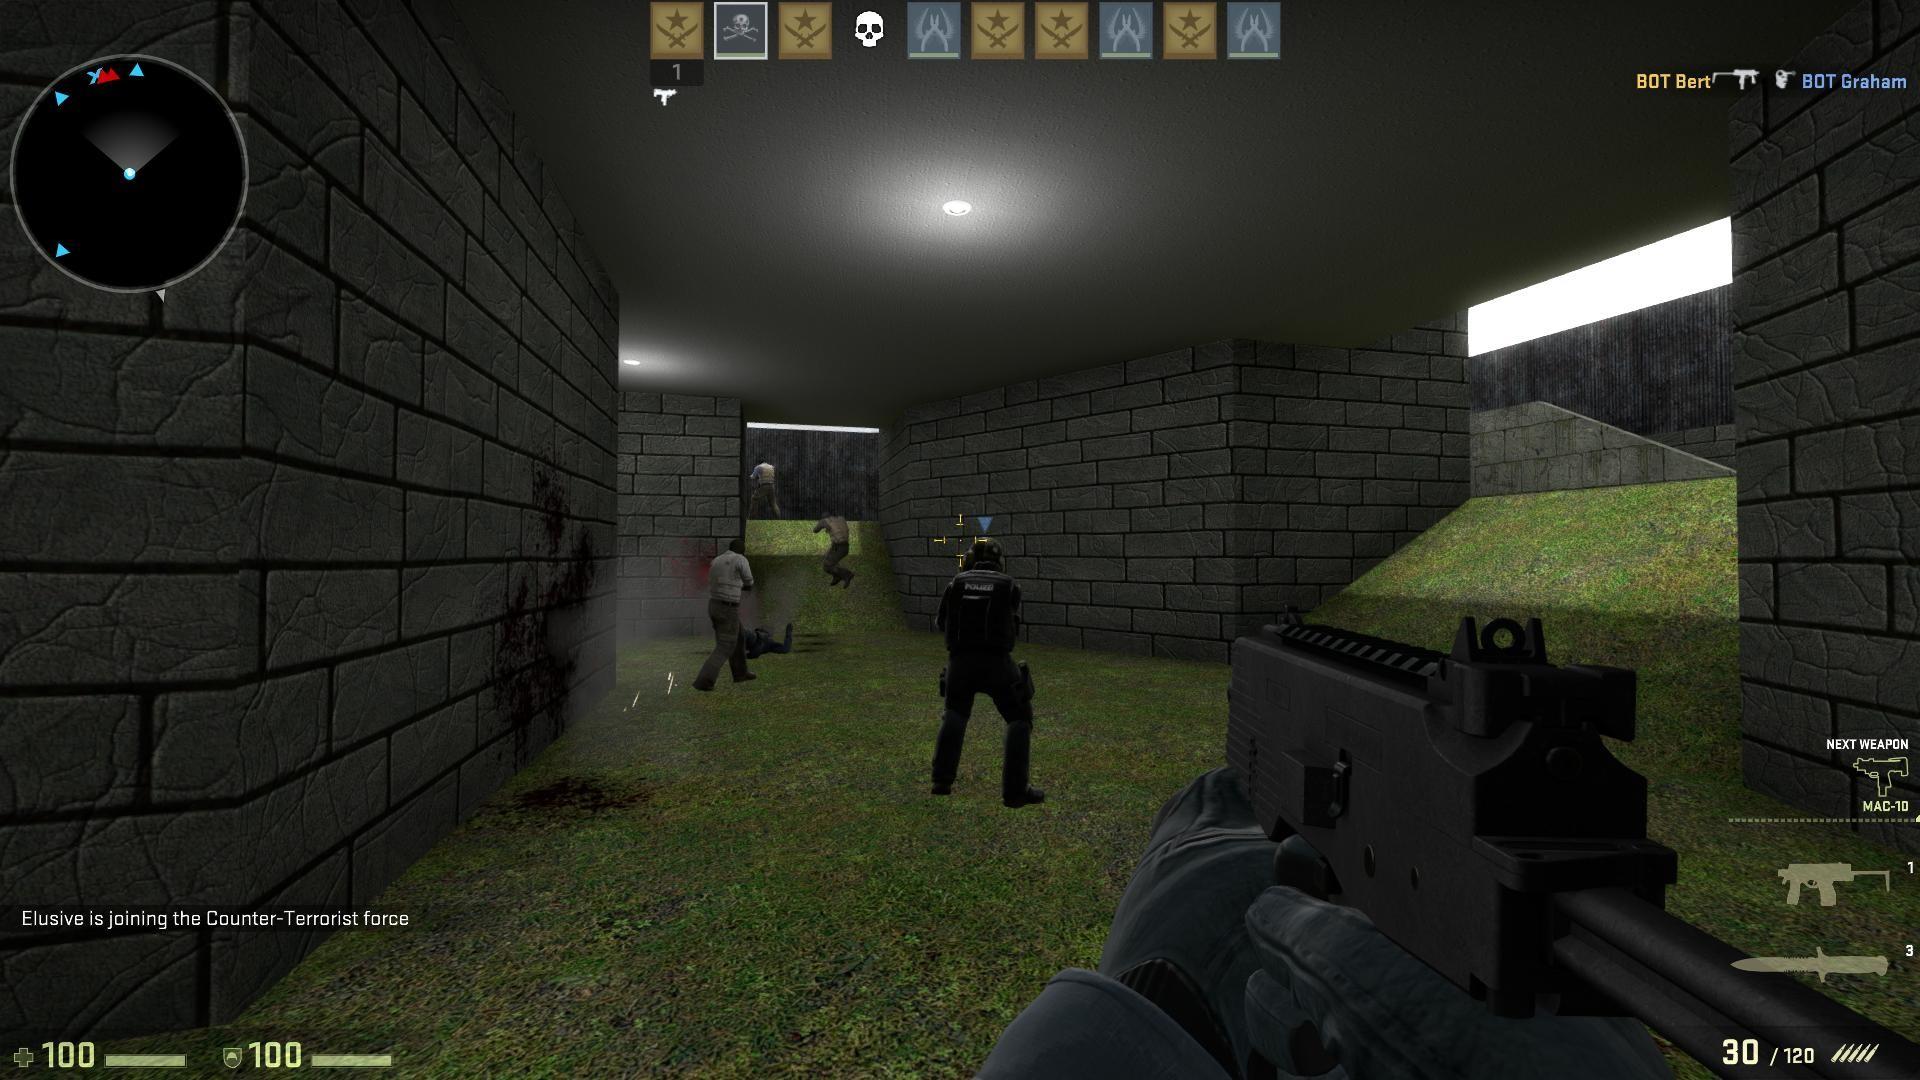 http://endgegner.fightercom.de/CounterStrikeGlobalOffensive/screen-ar_hatearena2.jpg